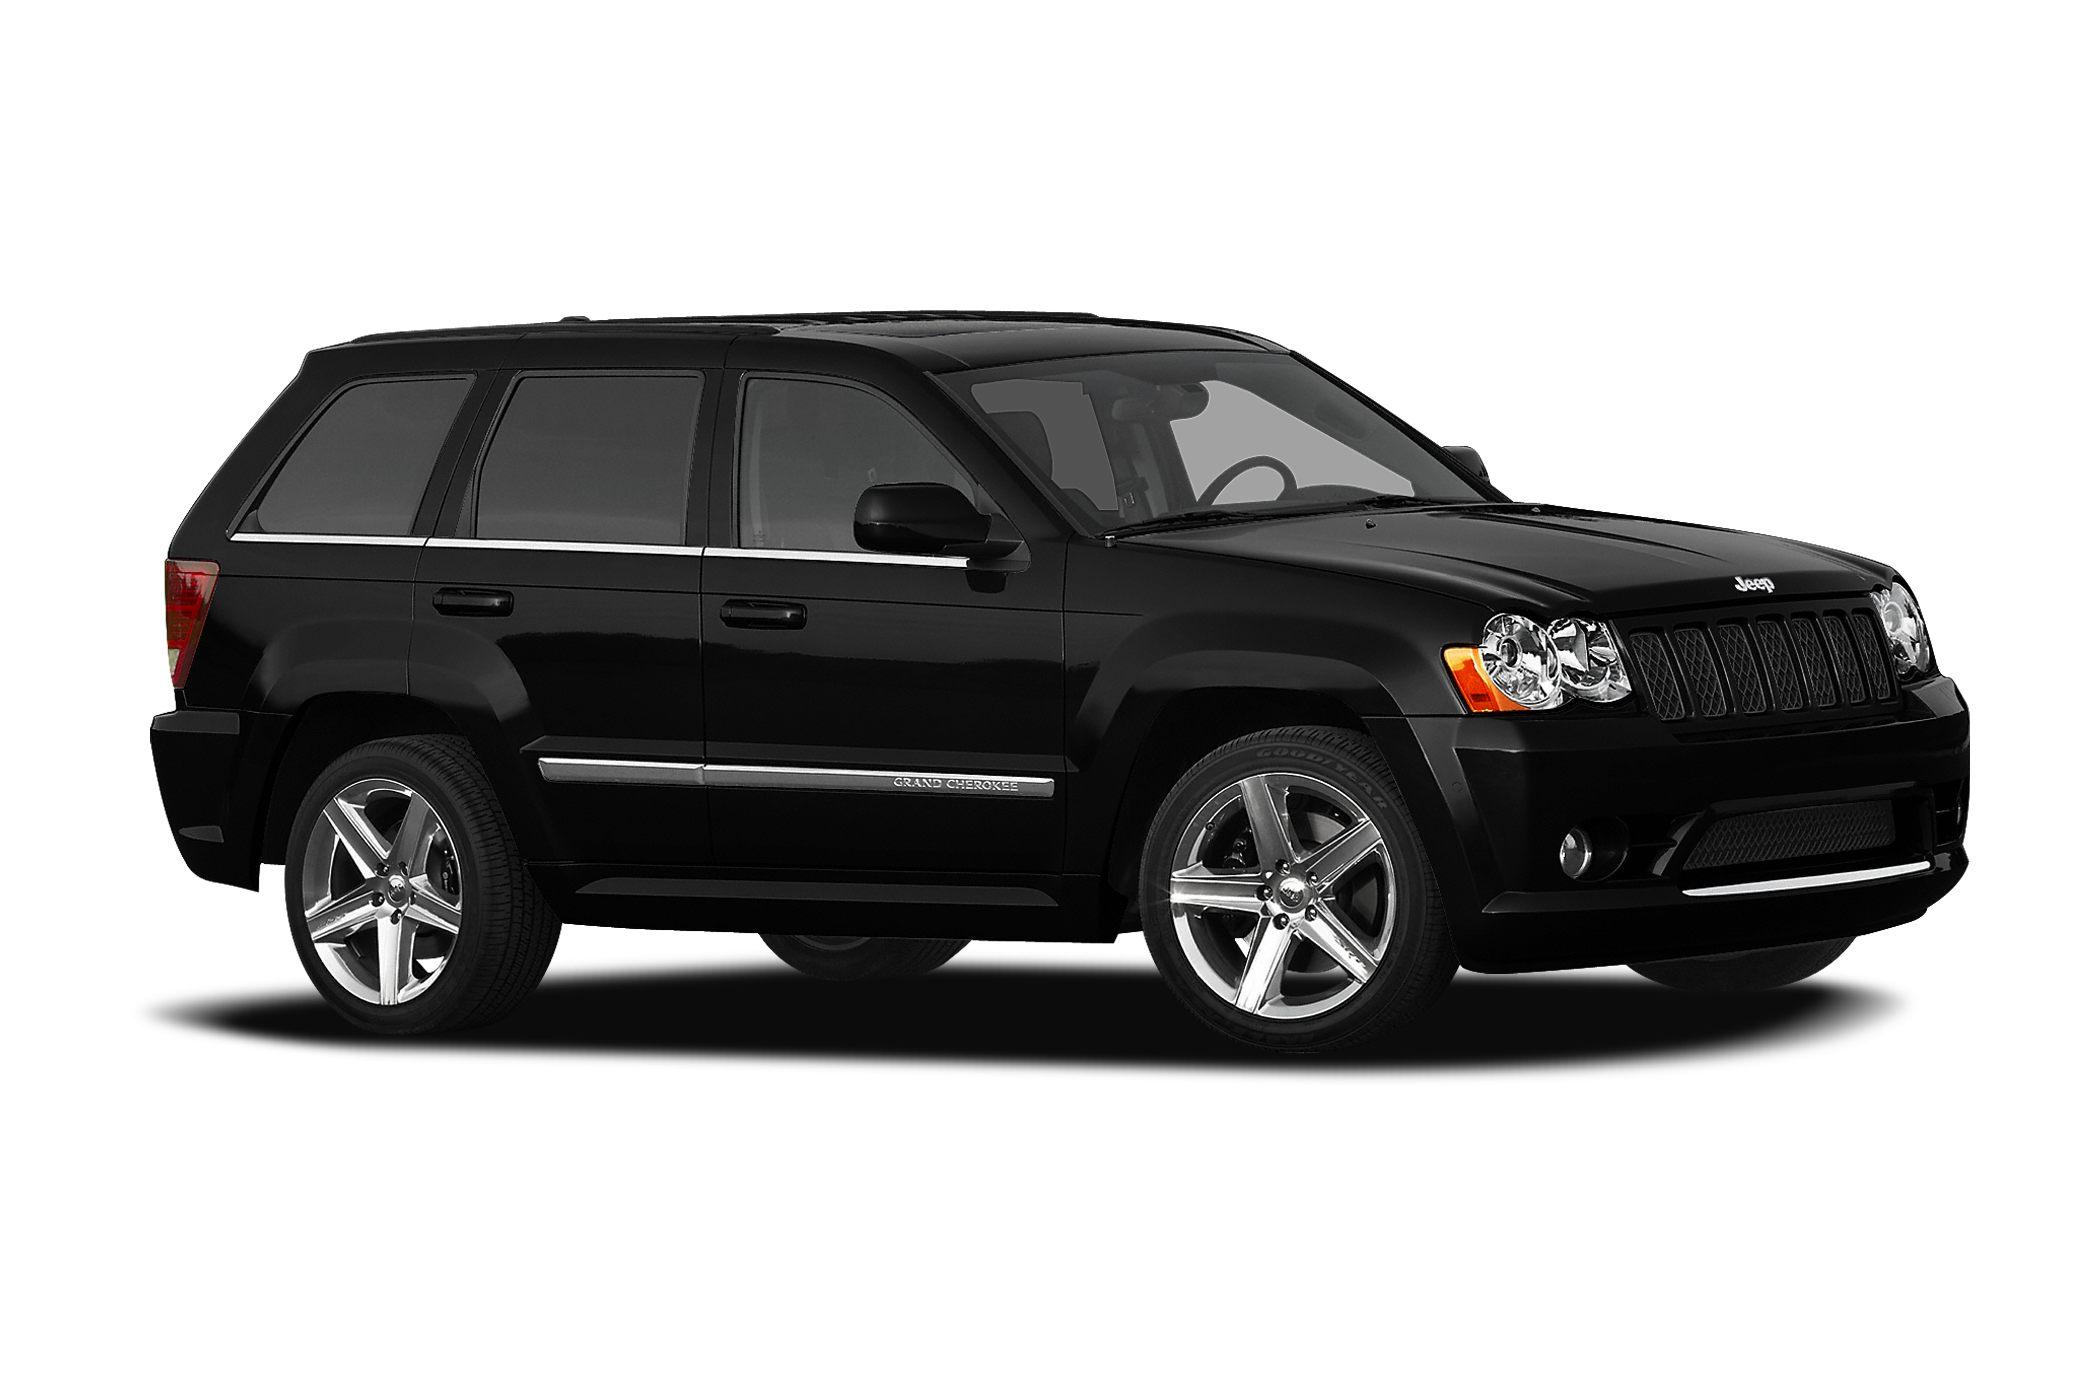 2010 srt8 jeep transmission